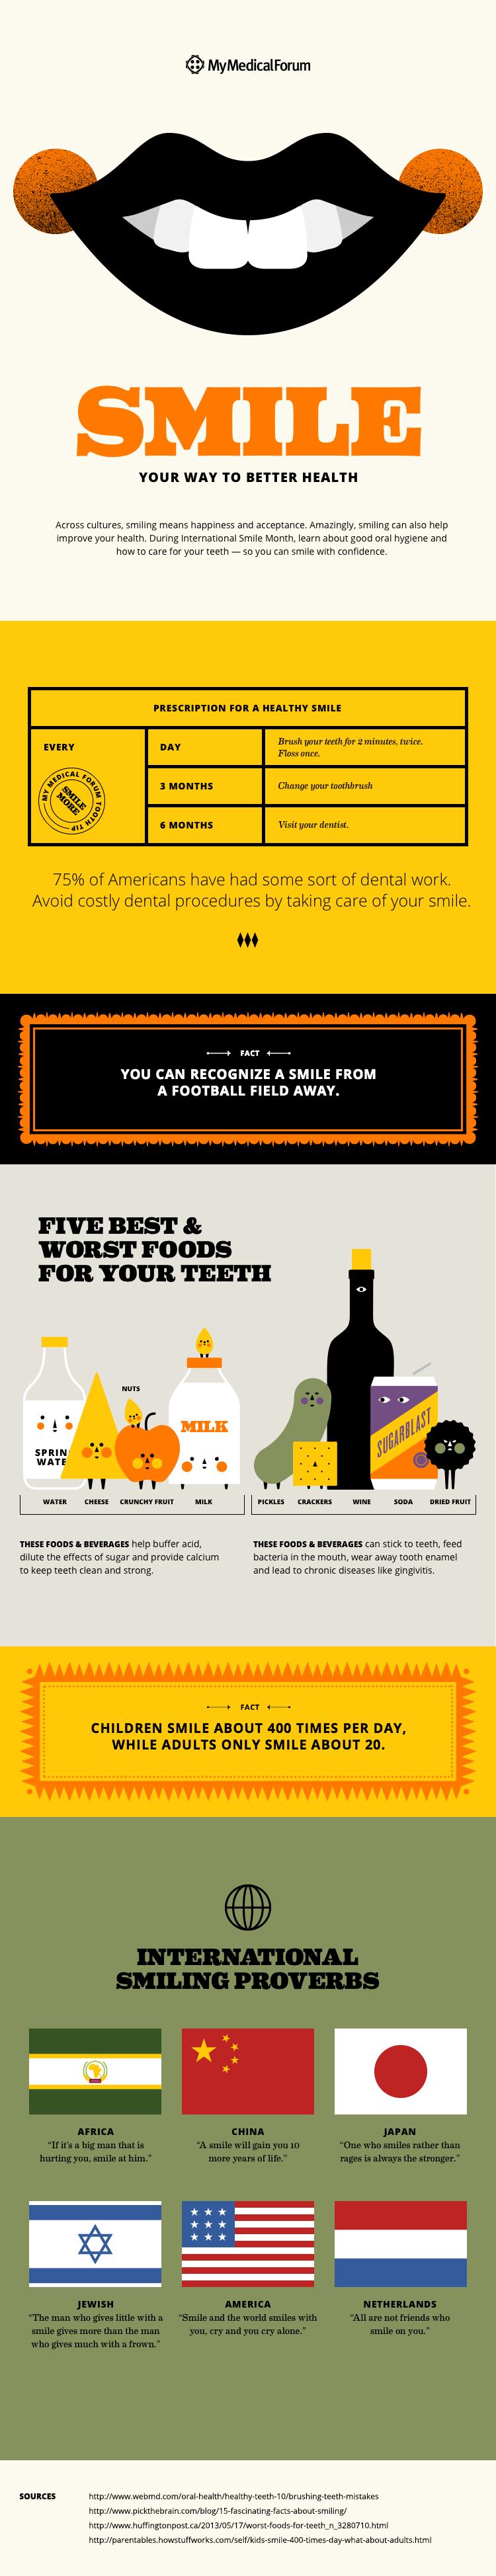 Smile-infographic